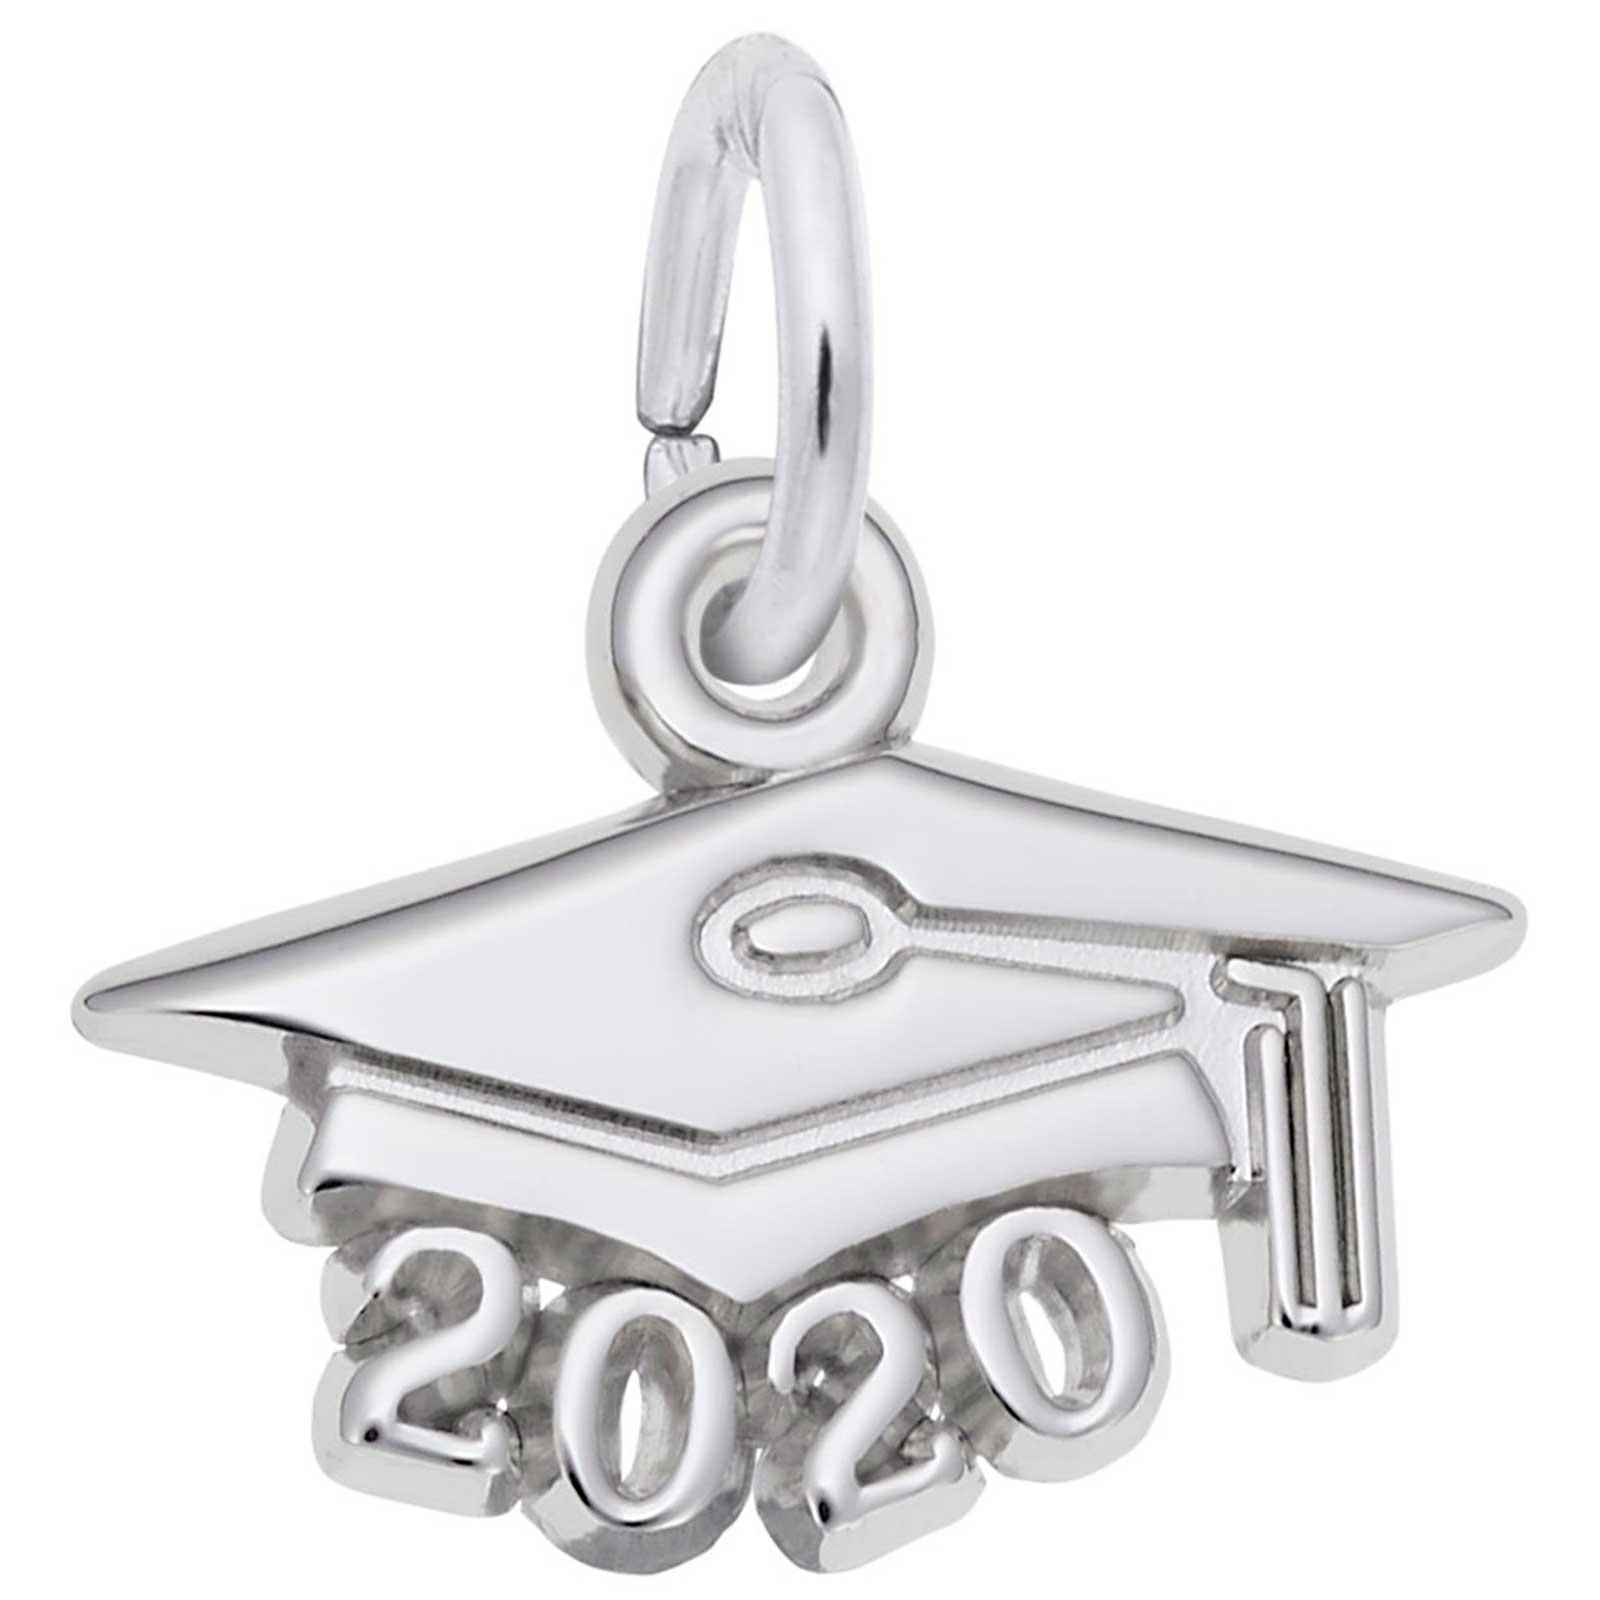 Rembrandt Graduation Cap 2020 Charm, Sterling Silver